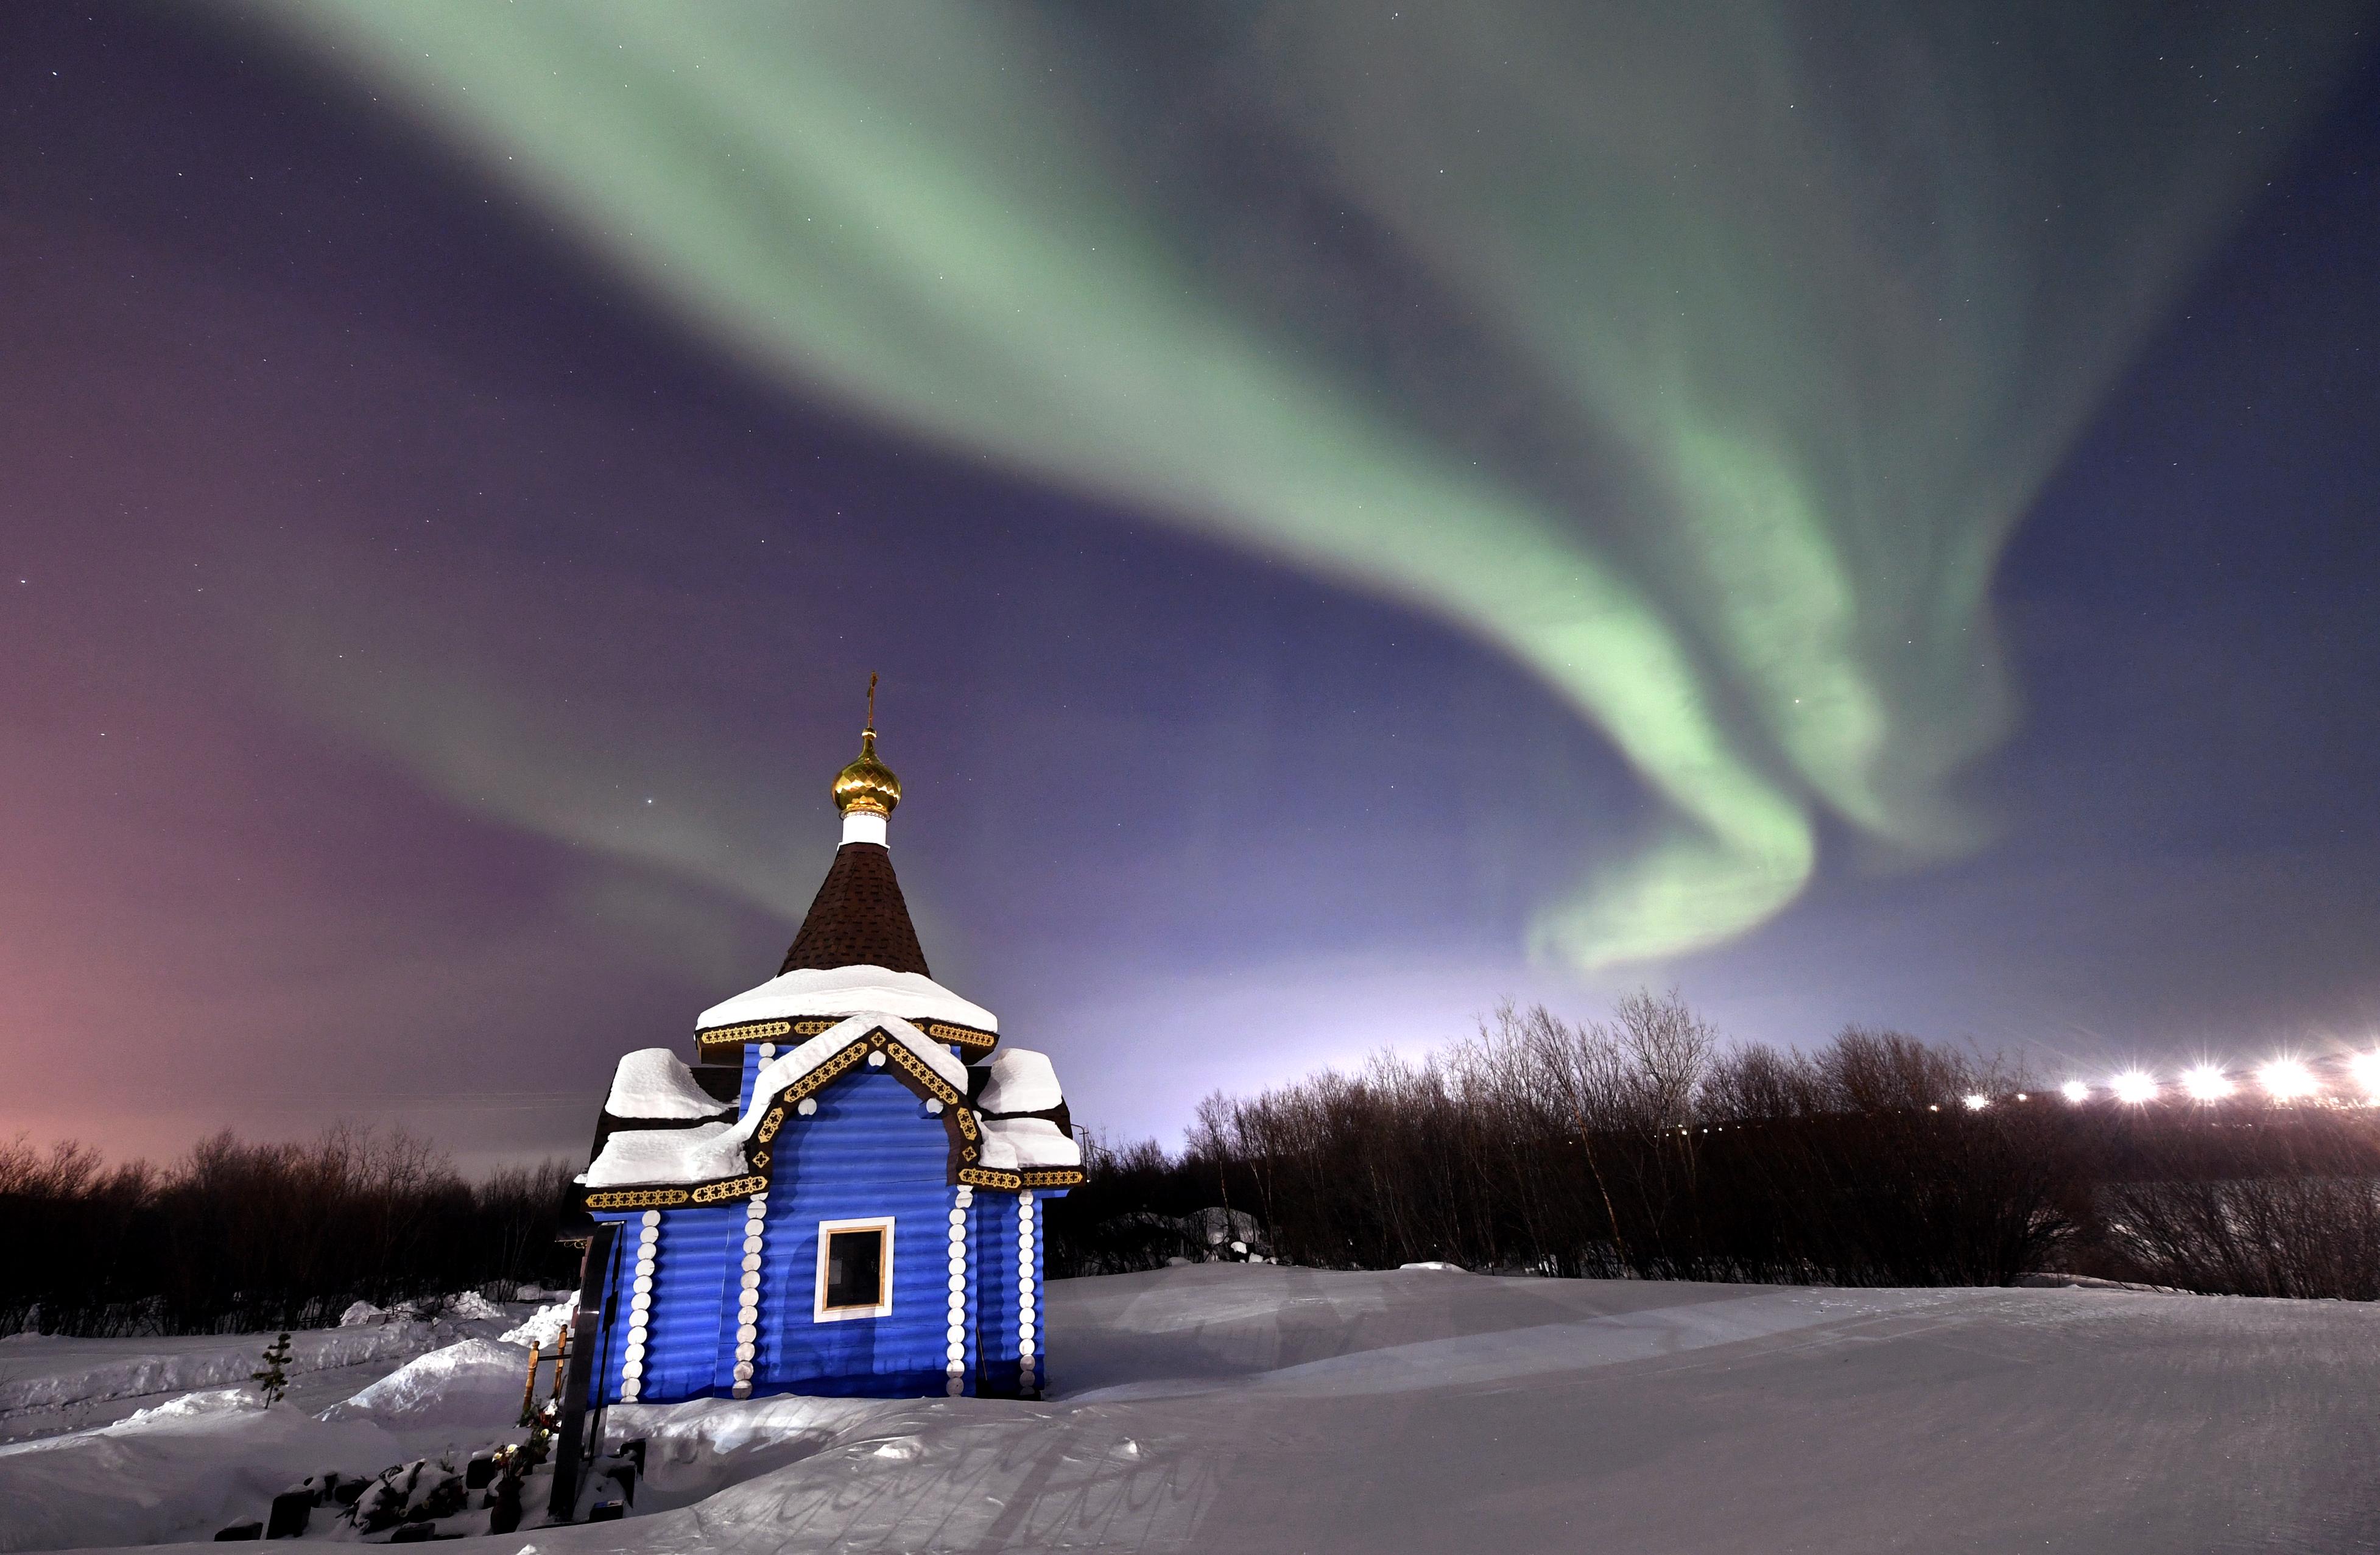 Northern lights in Murmansk, Russia